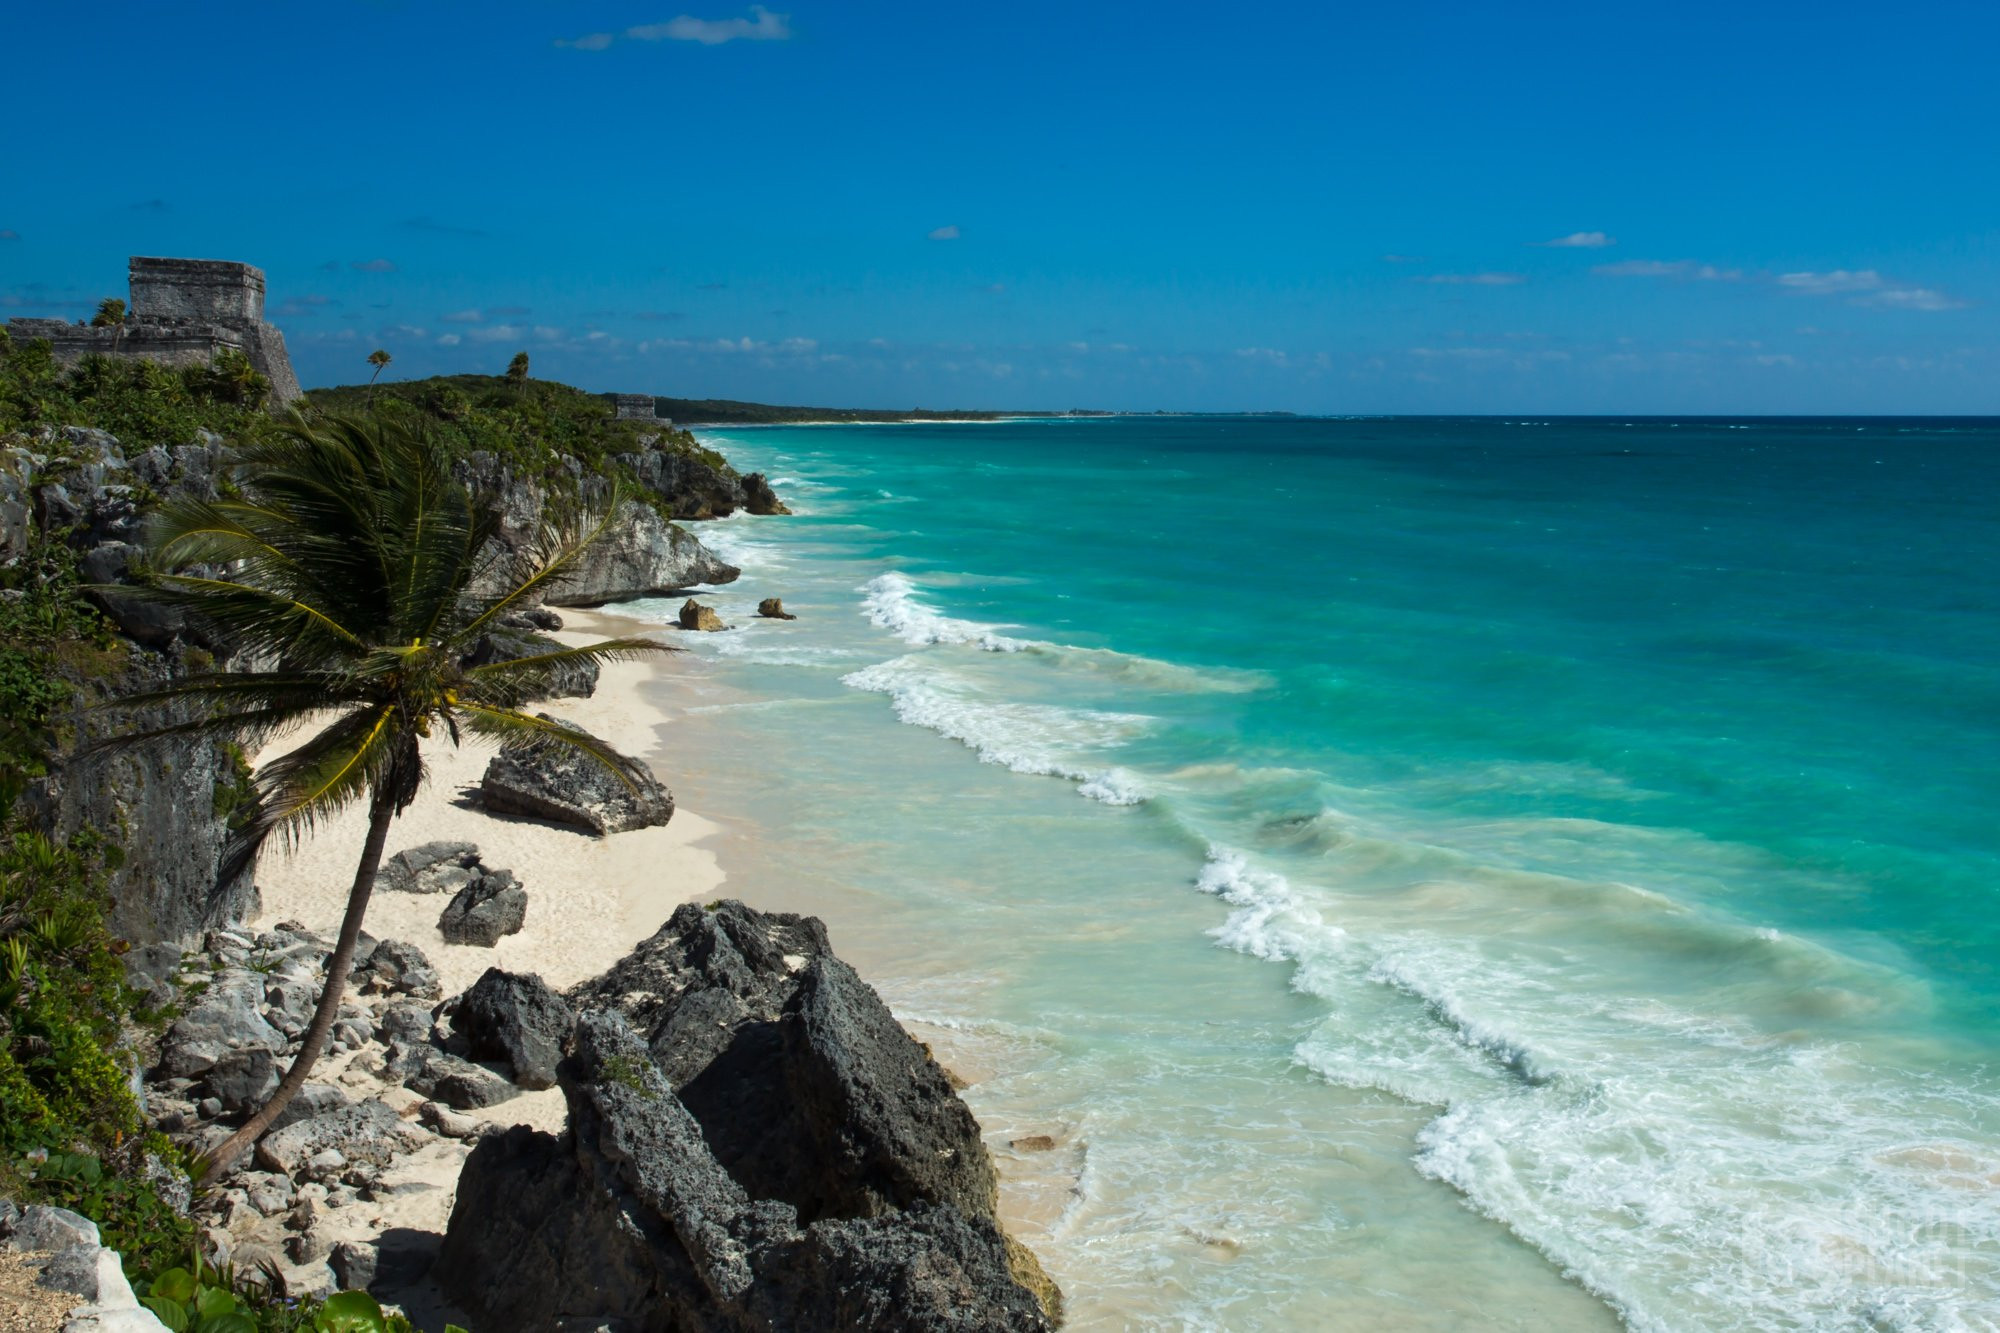 Tulum Mayan temple, Caribbean Sea, Mexico